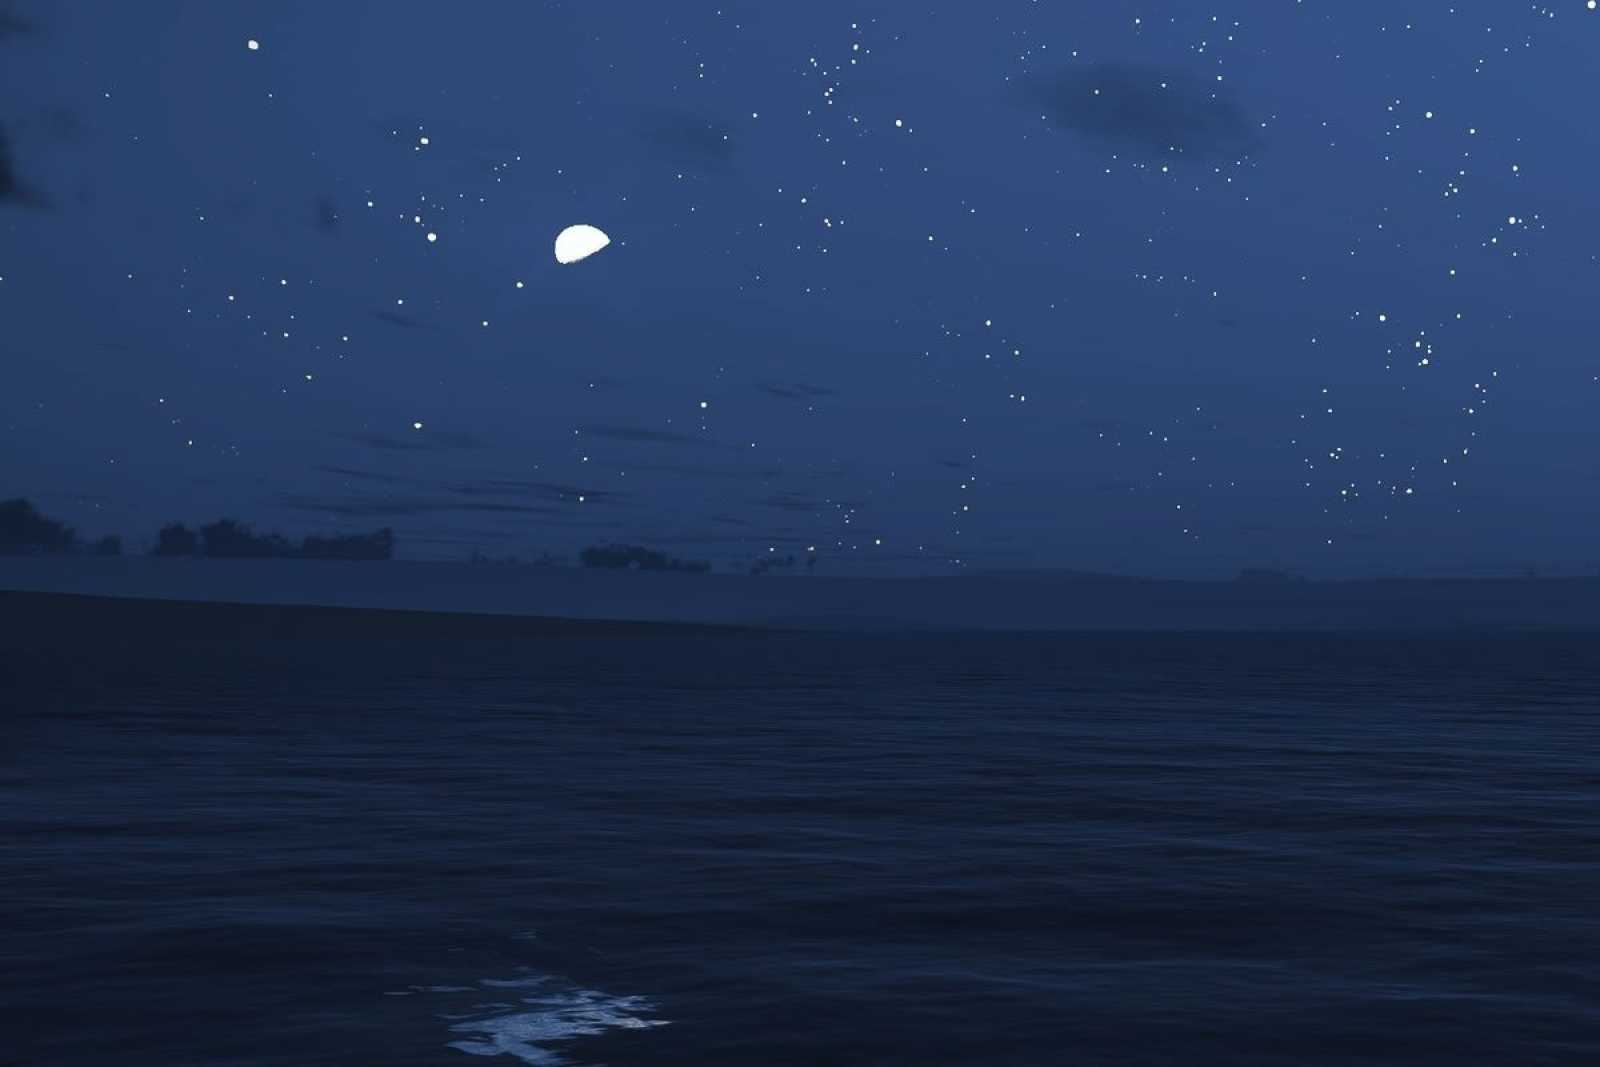 Stars ship navigation